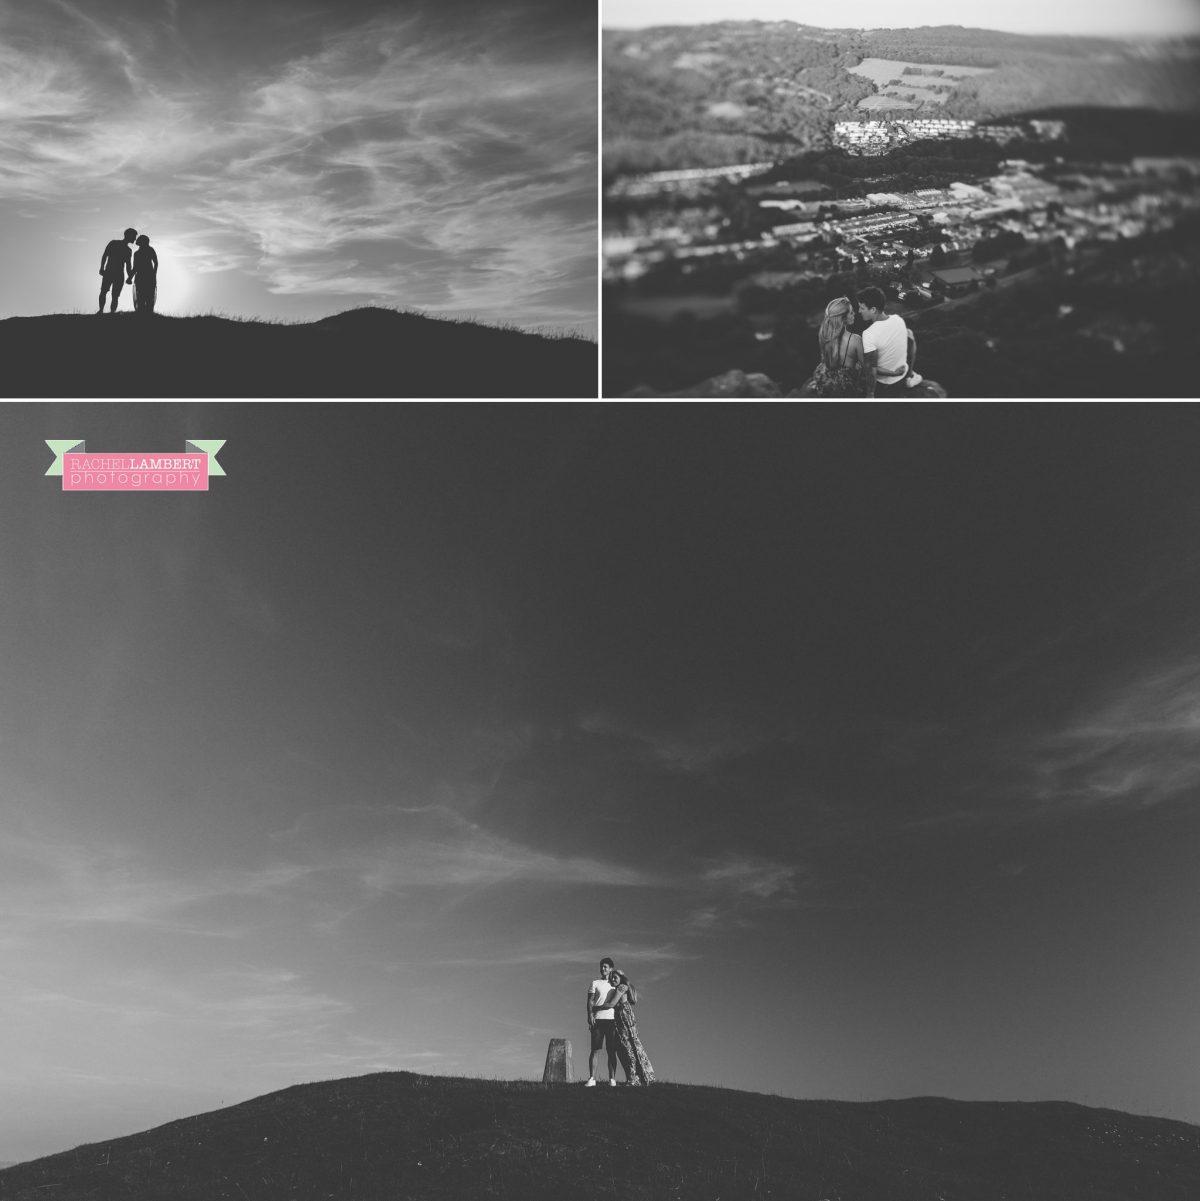 welsh_wedding_photographer_decourceys_rachel_lambert_photography_ceri_chris_engagement_shoot_garth_mountain_ 4